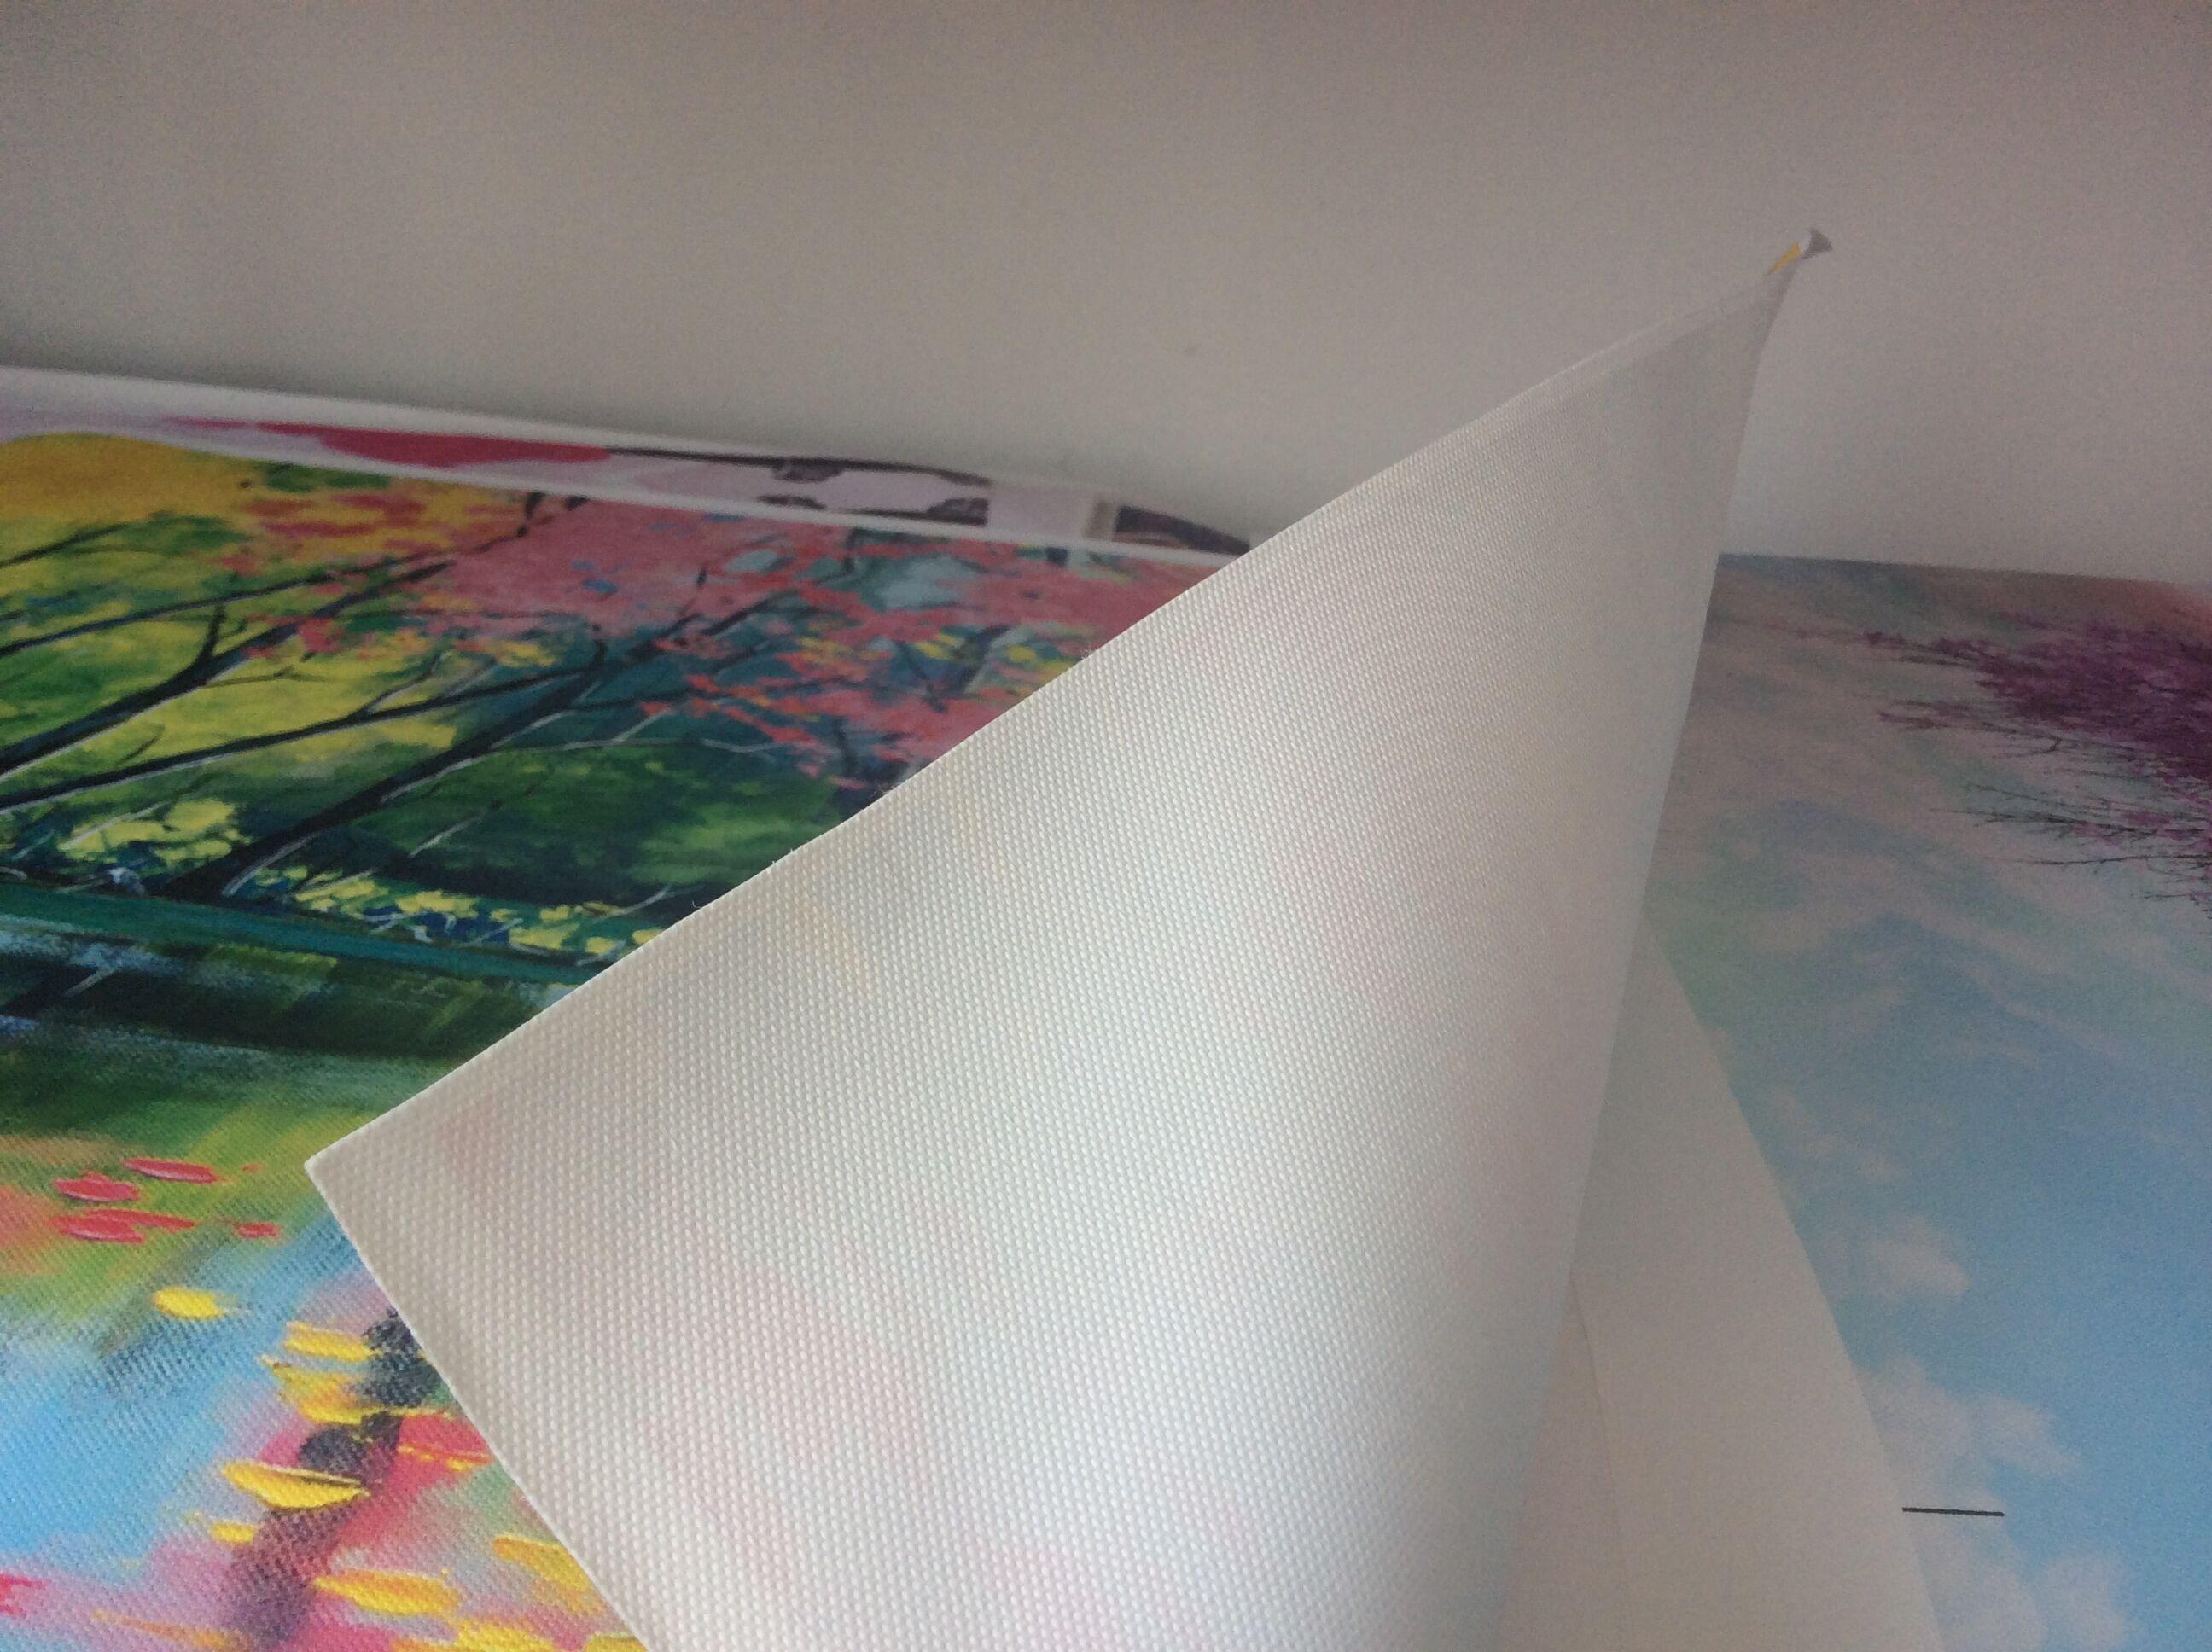 LARGE 5Panels Sea Beach Seascape Landscape Picture Poster Giclee Canvas Prints Home Hotel Decor interior No Frame